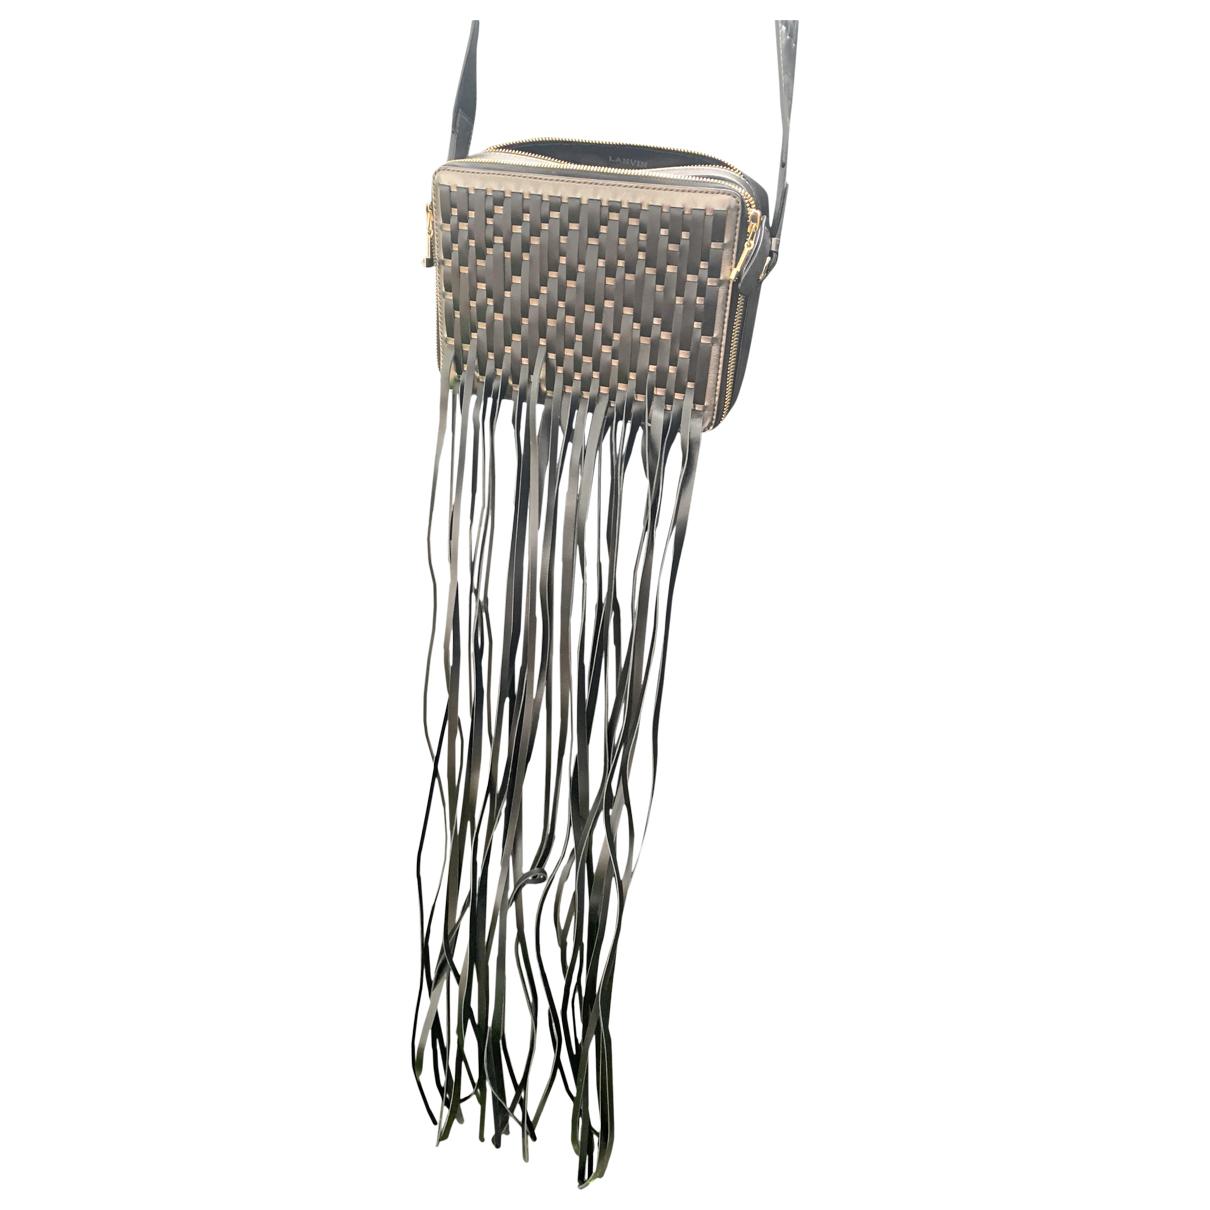 Lanvin N Metallic Leather handbag for Women N